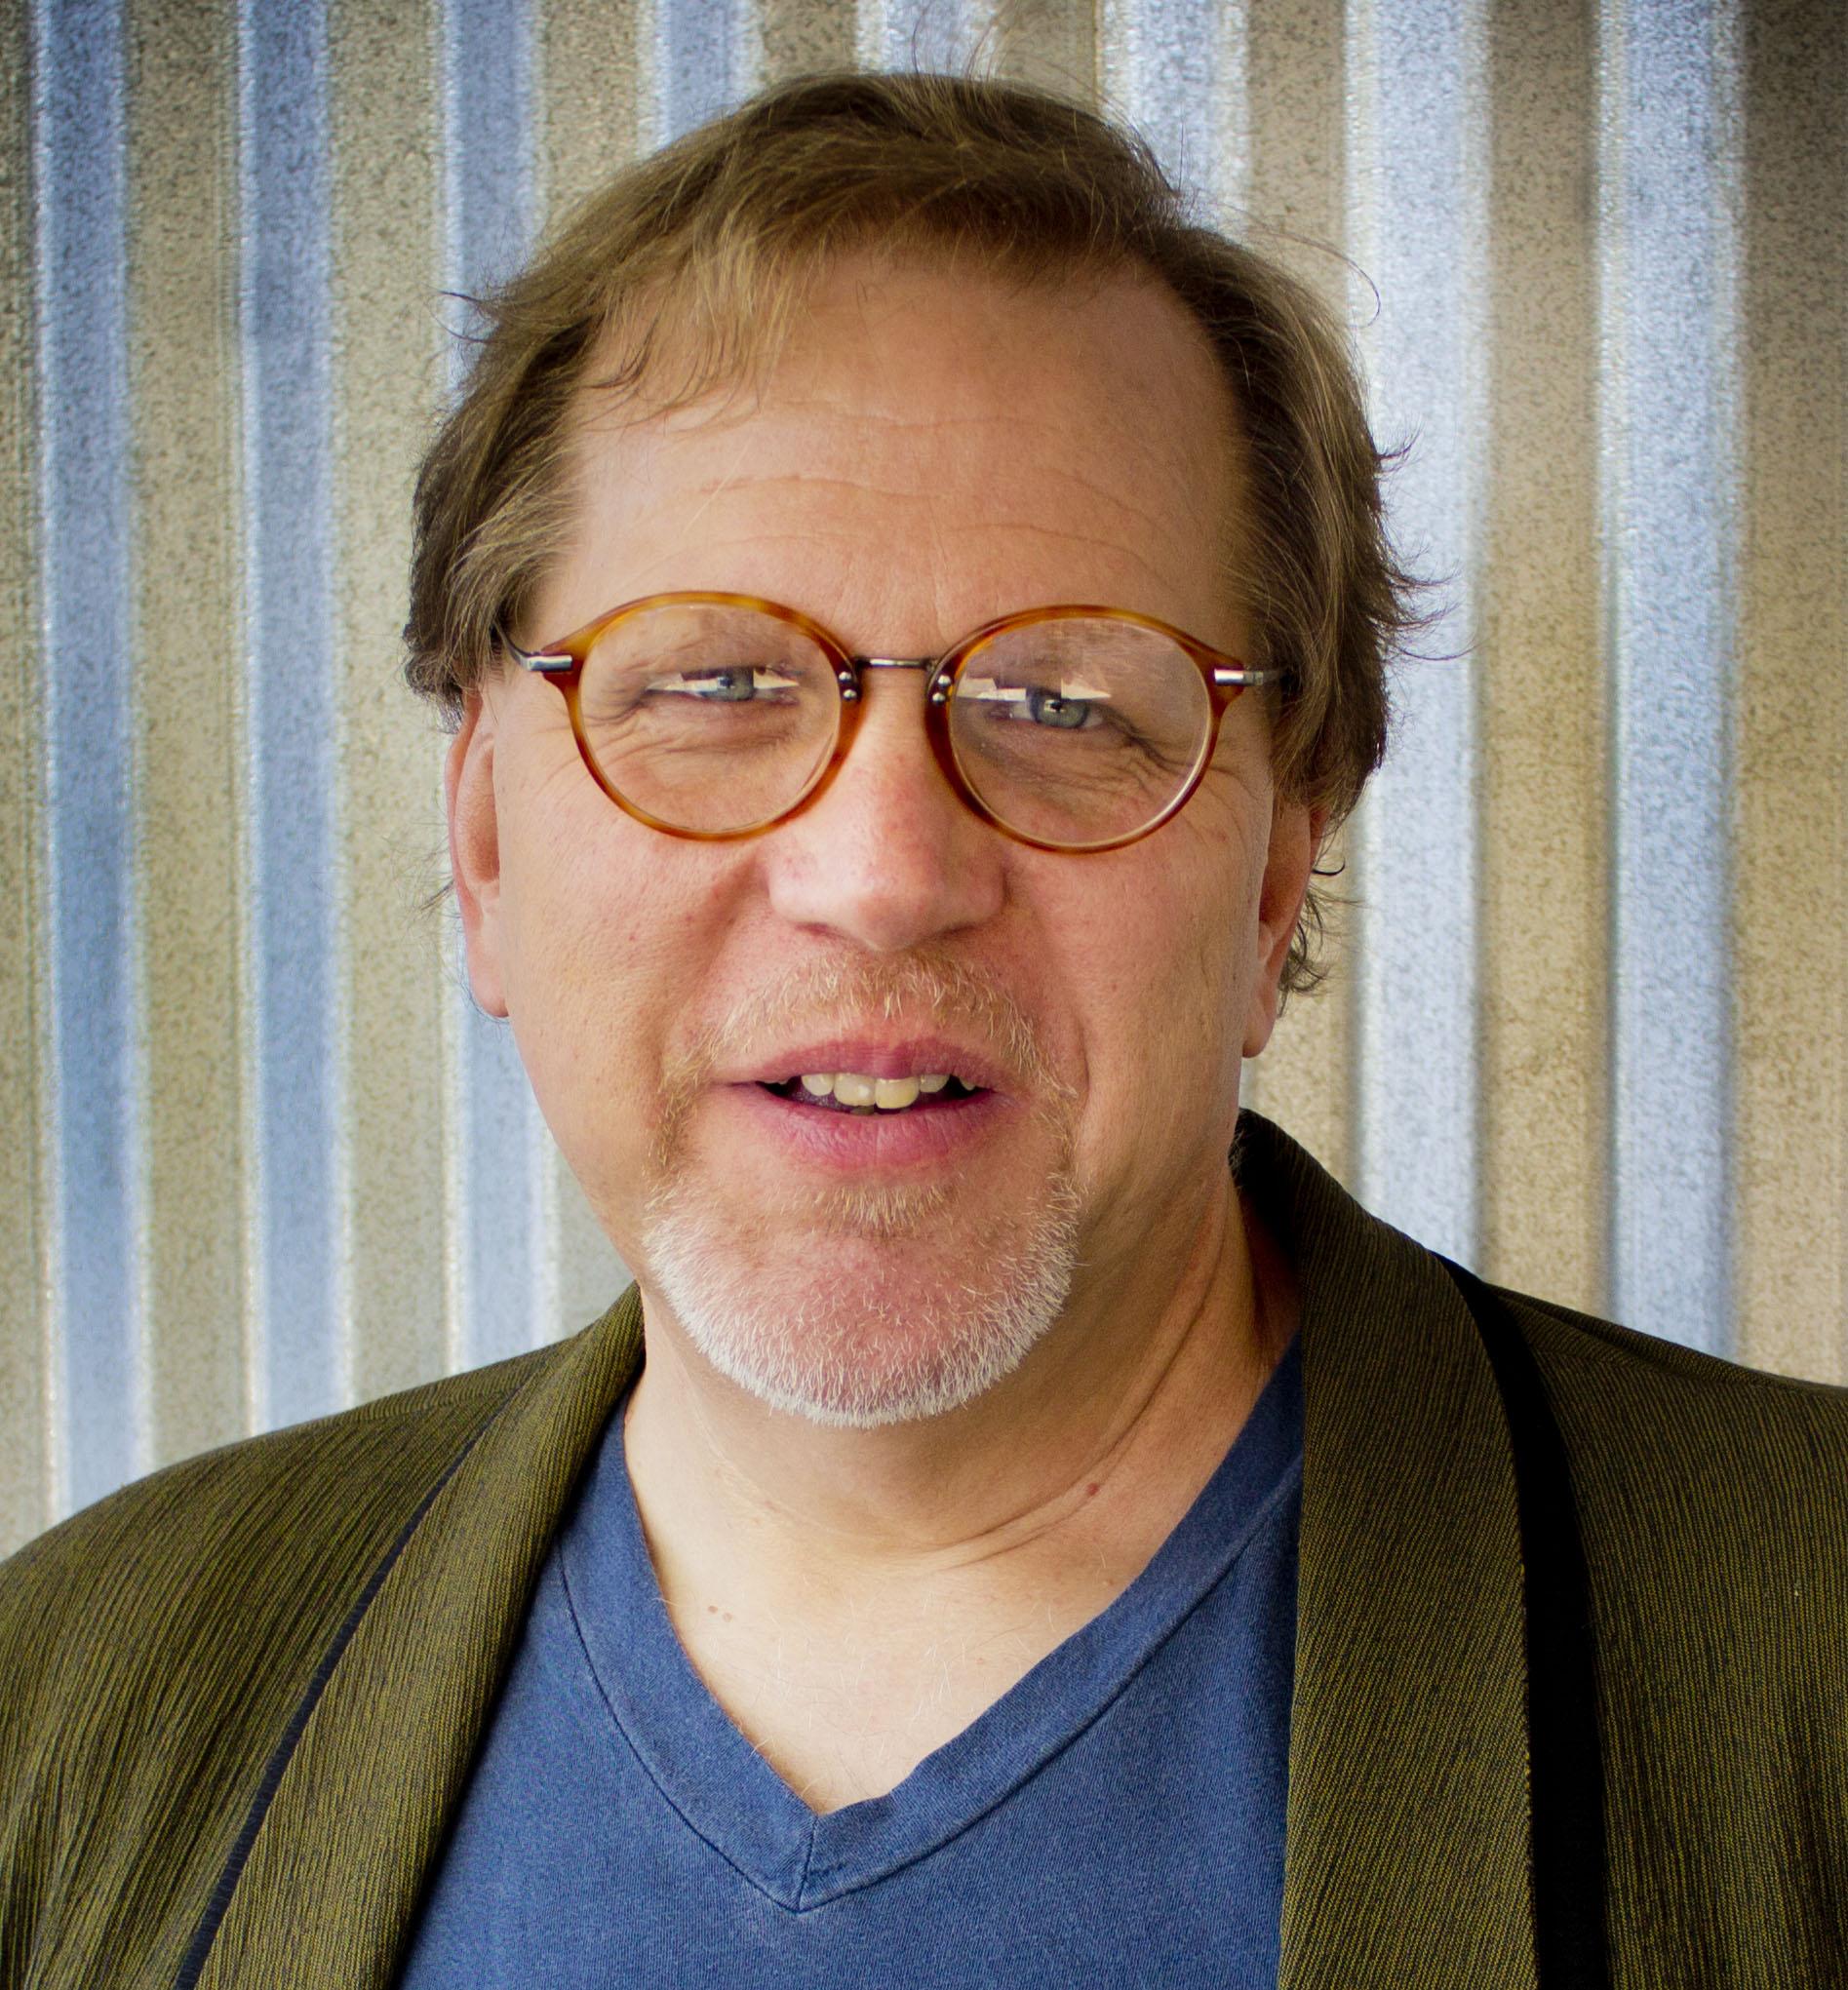 Keith McMillen, Founder & CEO, BeBop Sensors